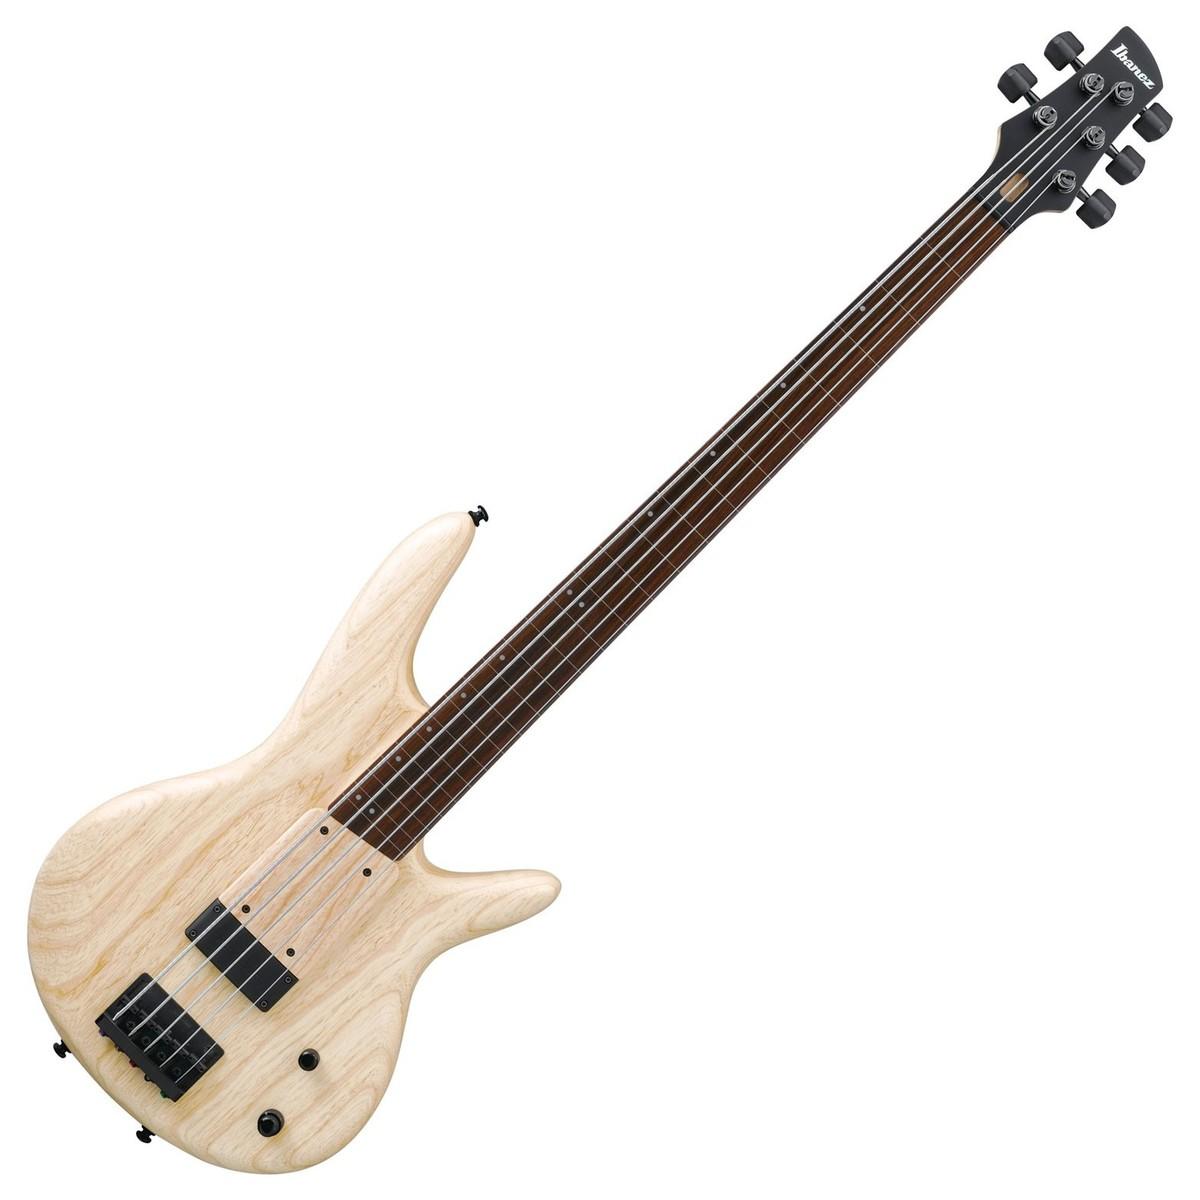 ibanez gwb1005 gary willis 5 string fretless bass 2018 natural flat at gear4music. Black Bedroom Furniture Sets. Home Design Ideas